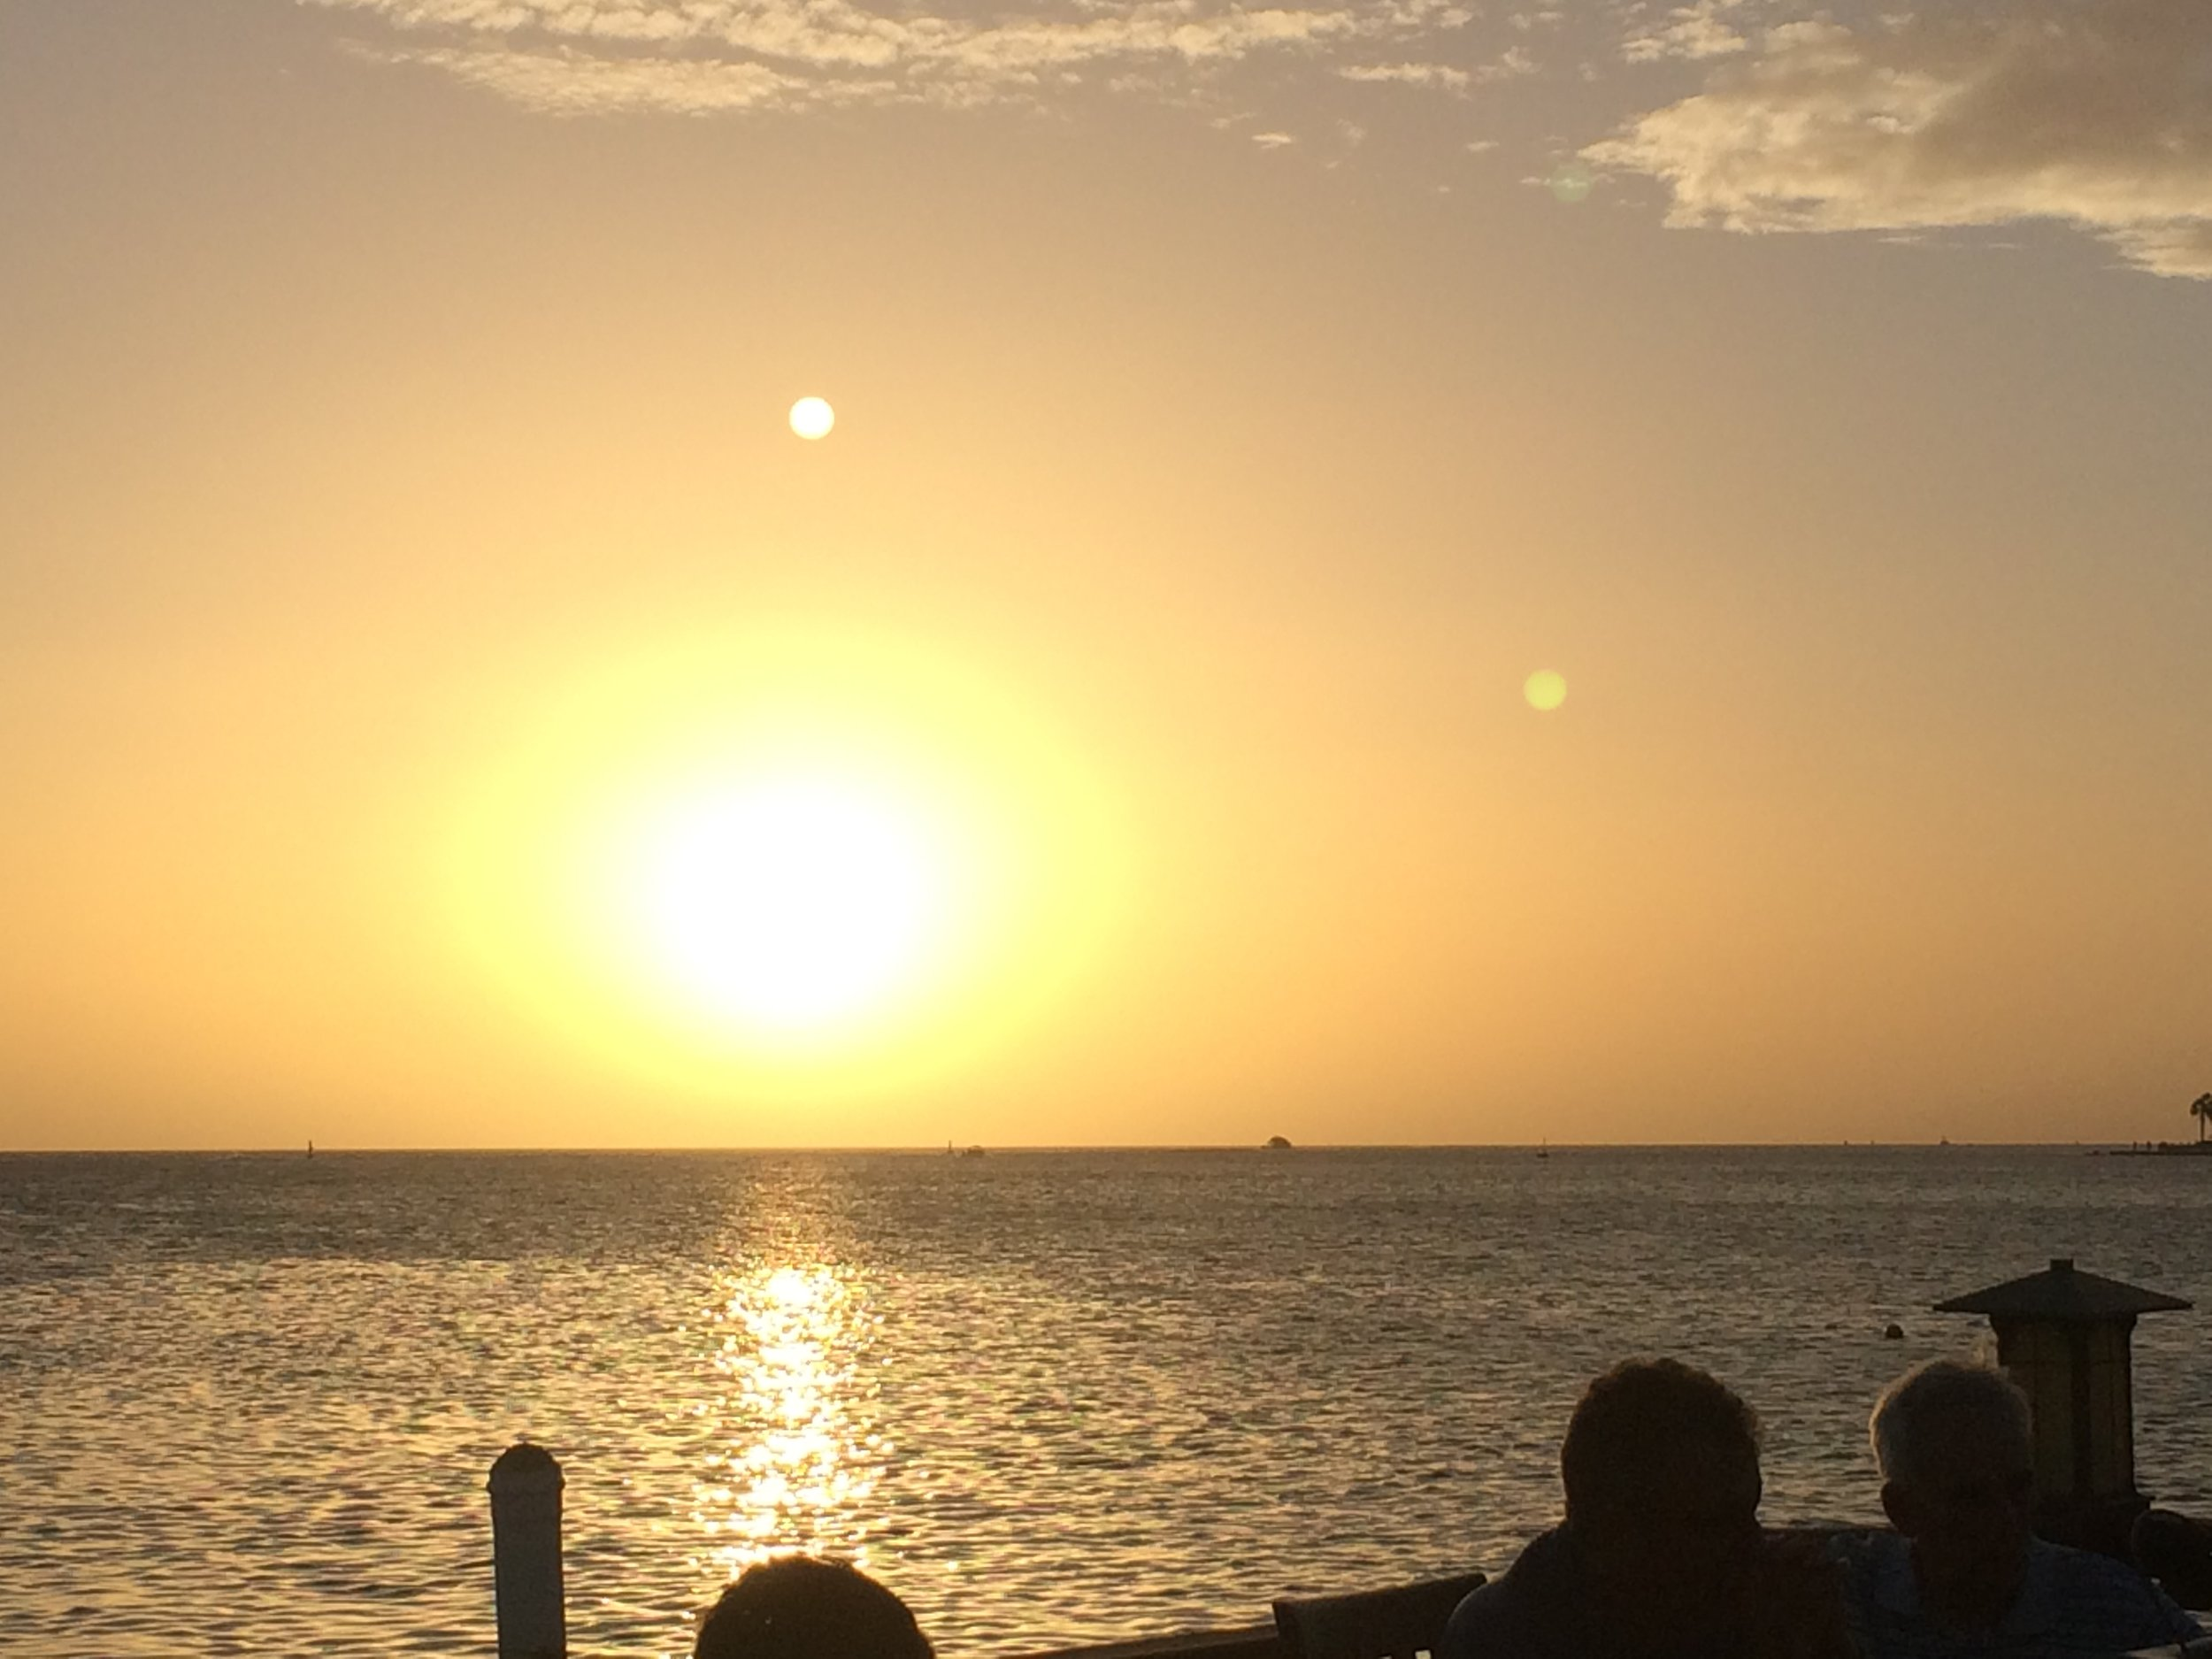 aruba - august 2014